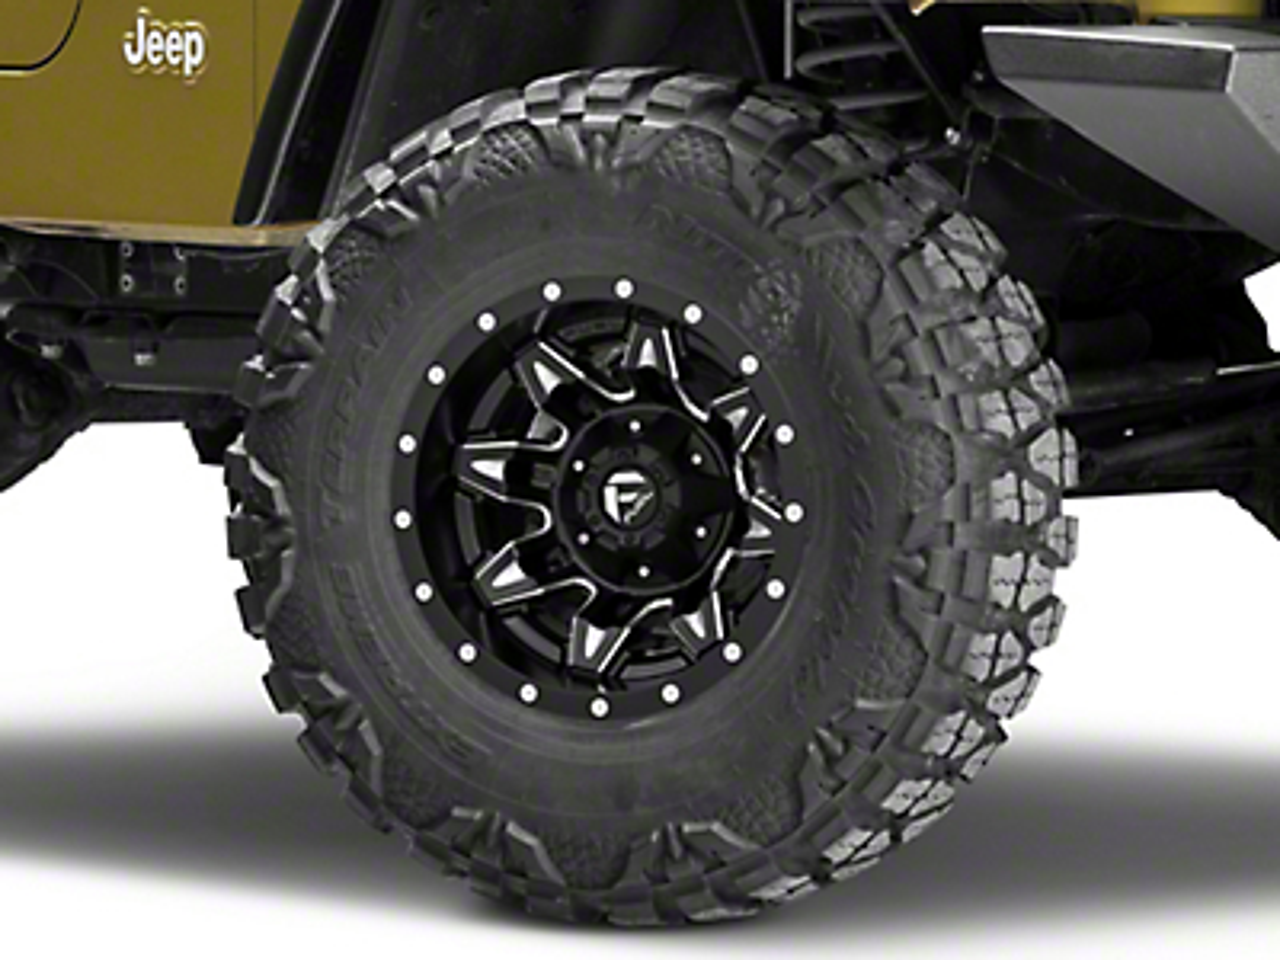 Fuel Wheels Lethal Matte Black Milled Wheel - 15x10 (87-06 Jeep Wrangler YJ & TJ)